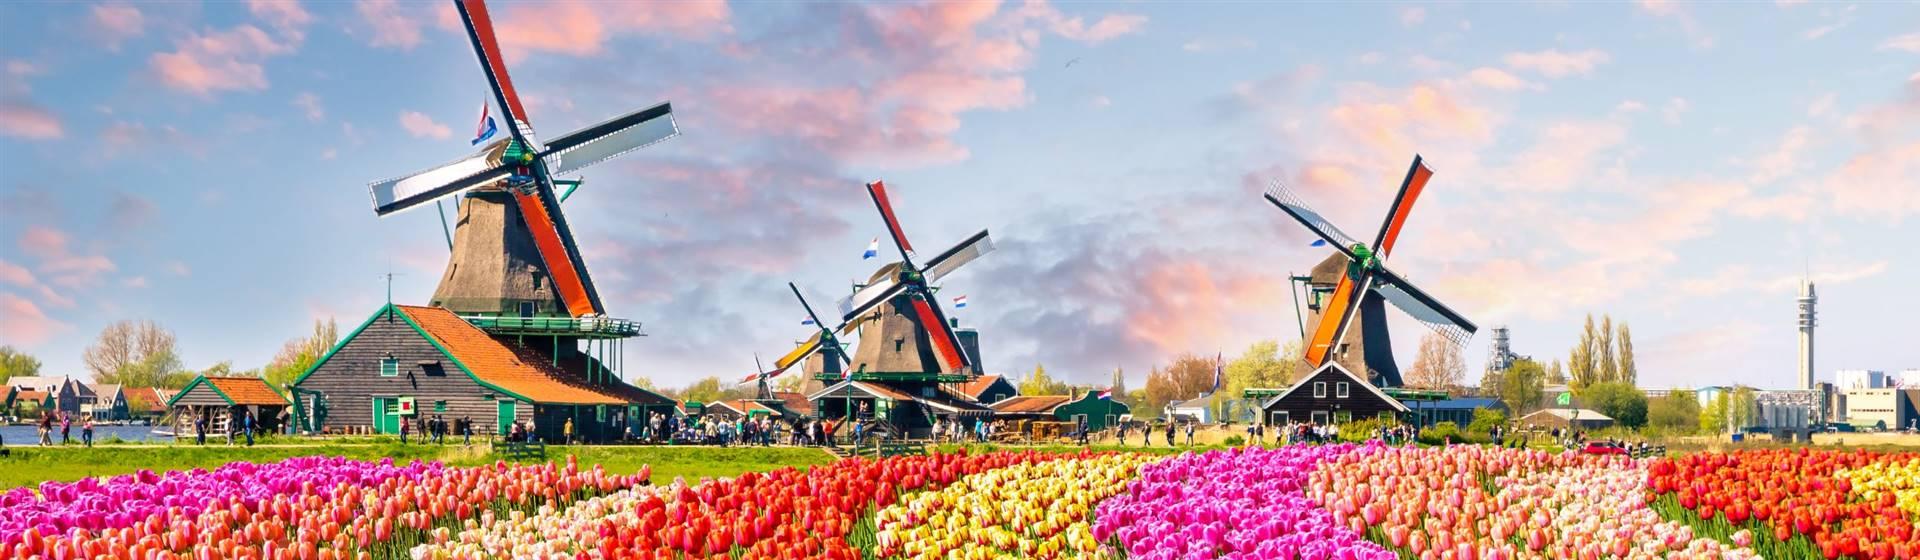 "<img src=""kuekenhof-with-windmill-©-adobestock.jpeg""  alt=""Windmills and Tulips"" />"